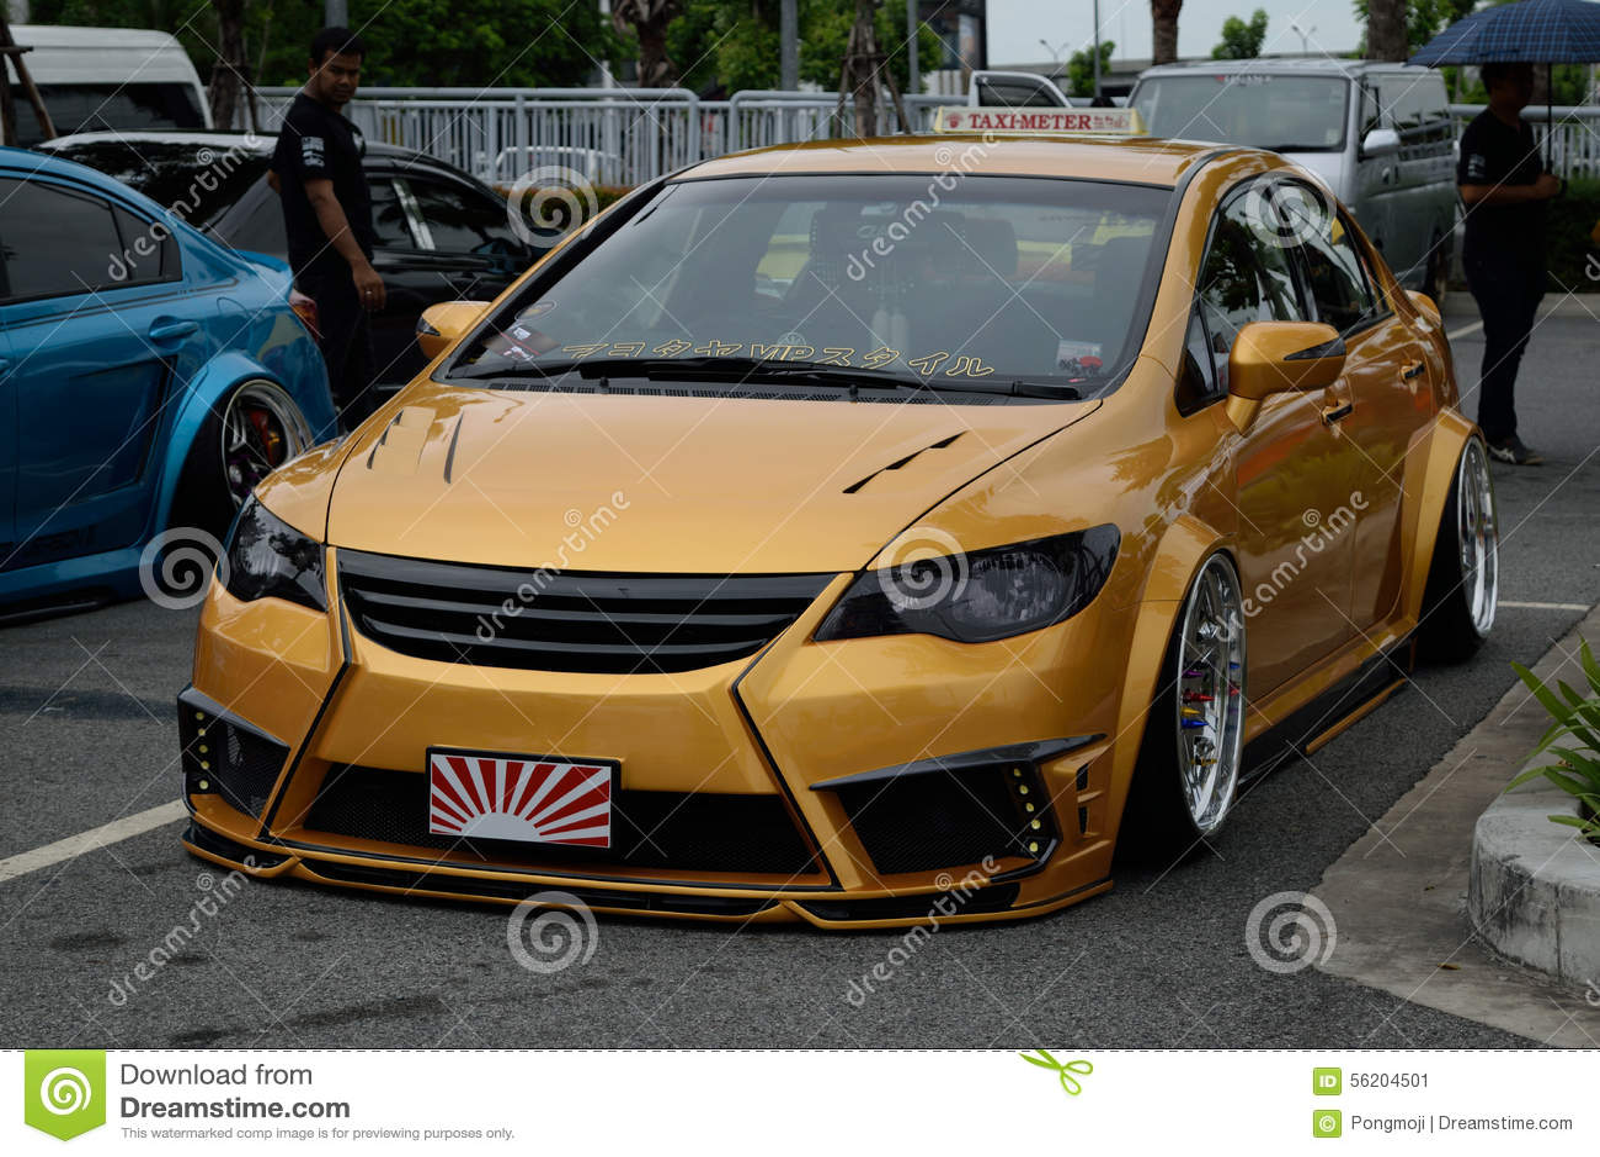 VIP Car In VIP Style